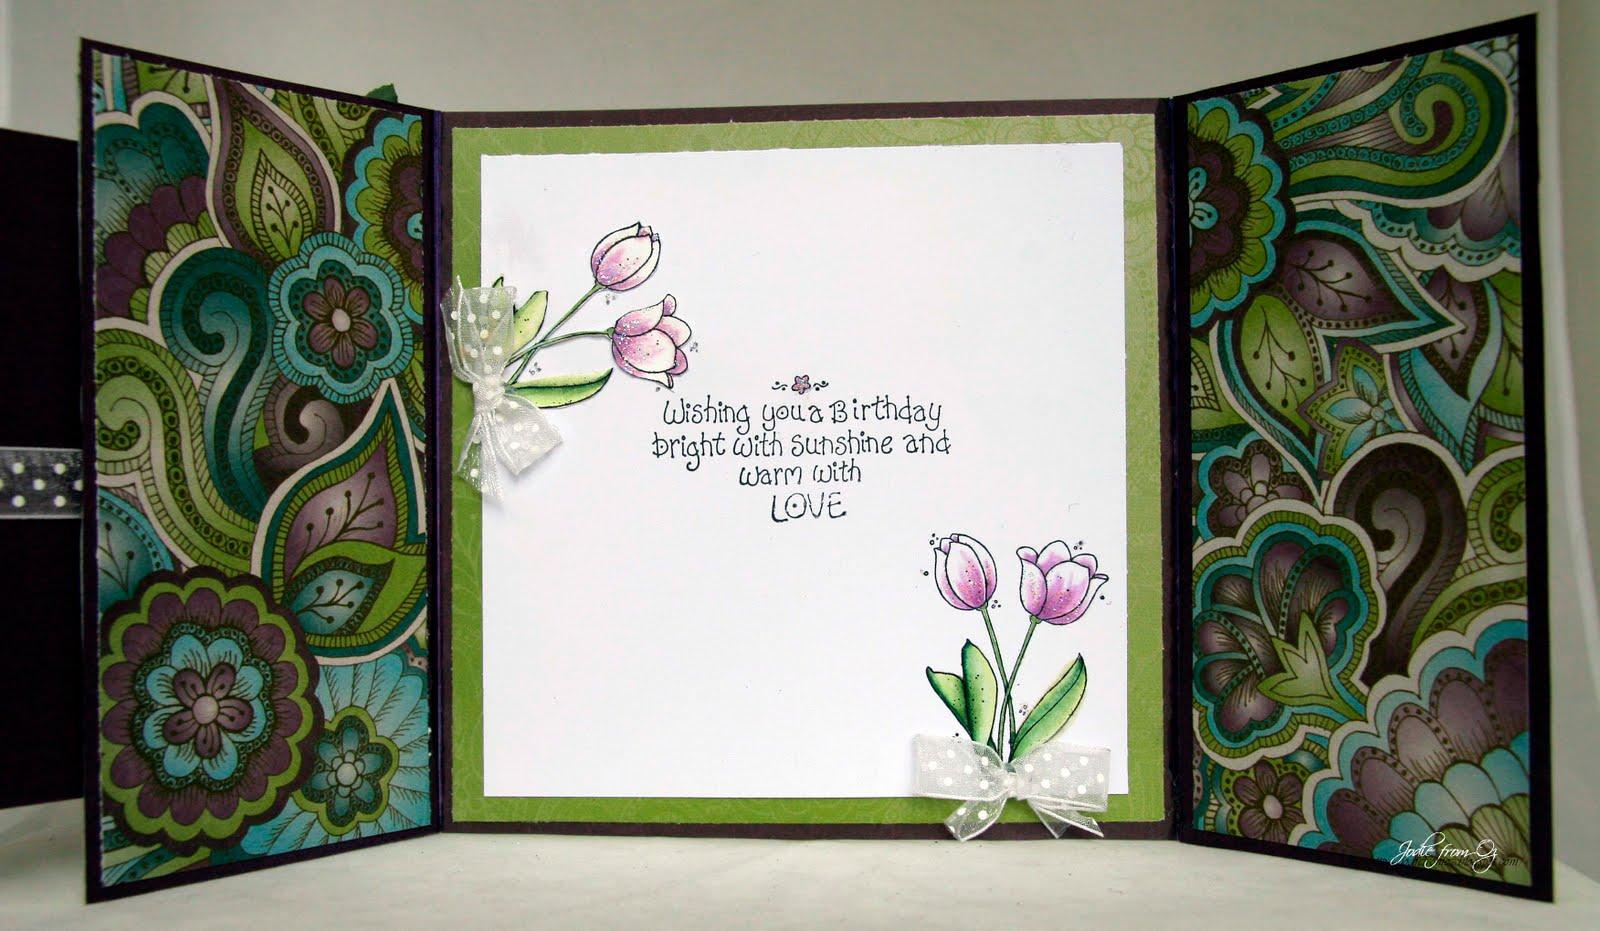 http://3.bp.blogspot.com/_lMVQxL7sBO4/TECFPWbfavI/AAAAAAAABYY/QeGf3n1ywW0/s1600/Tulip+Tilda+sends+special+birthday+wishes2.jpg